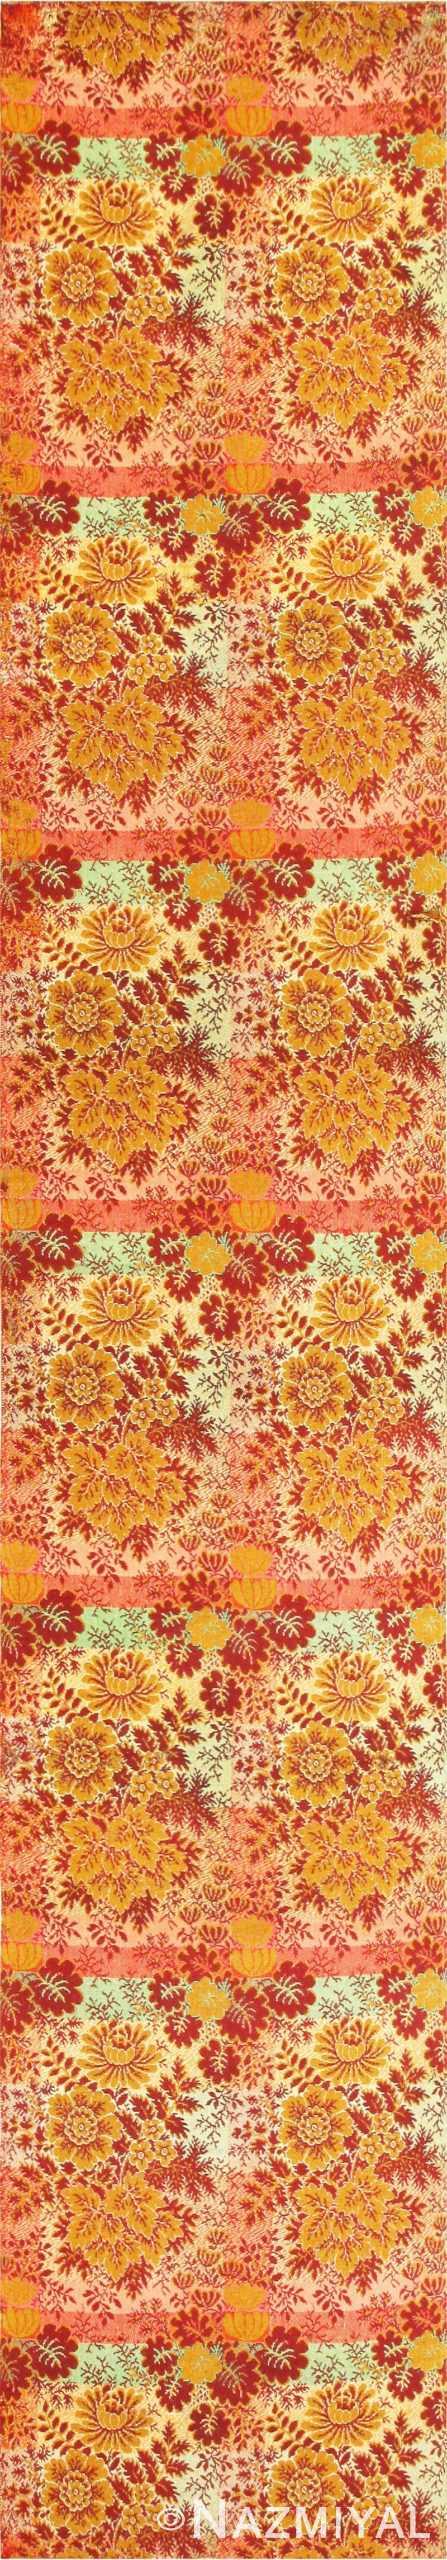 Floral Antique American Ingrain Runner Rug 50553 Nazmiyal